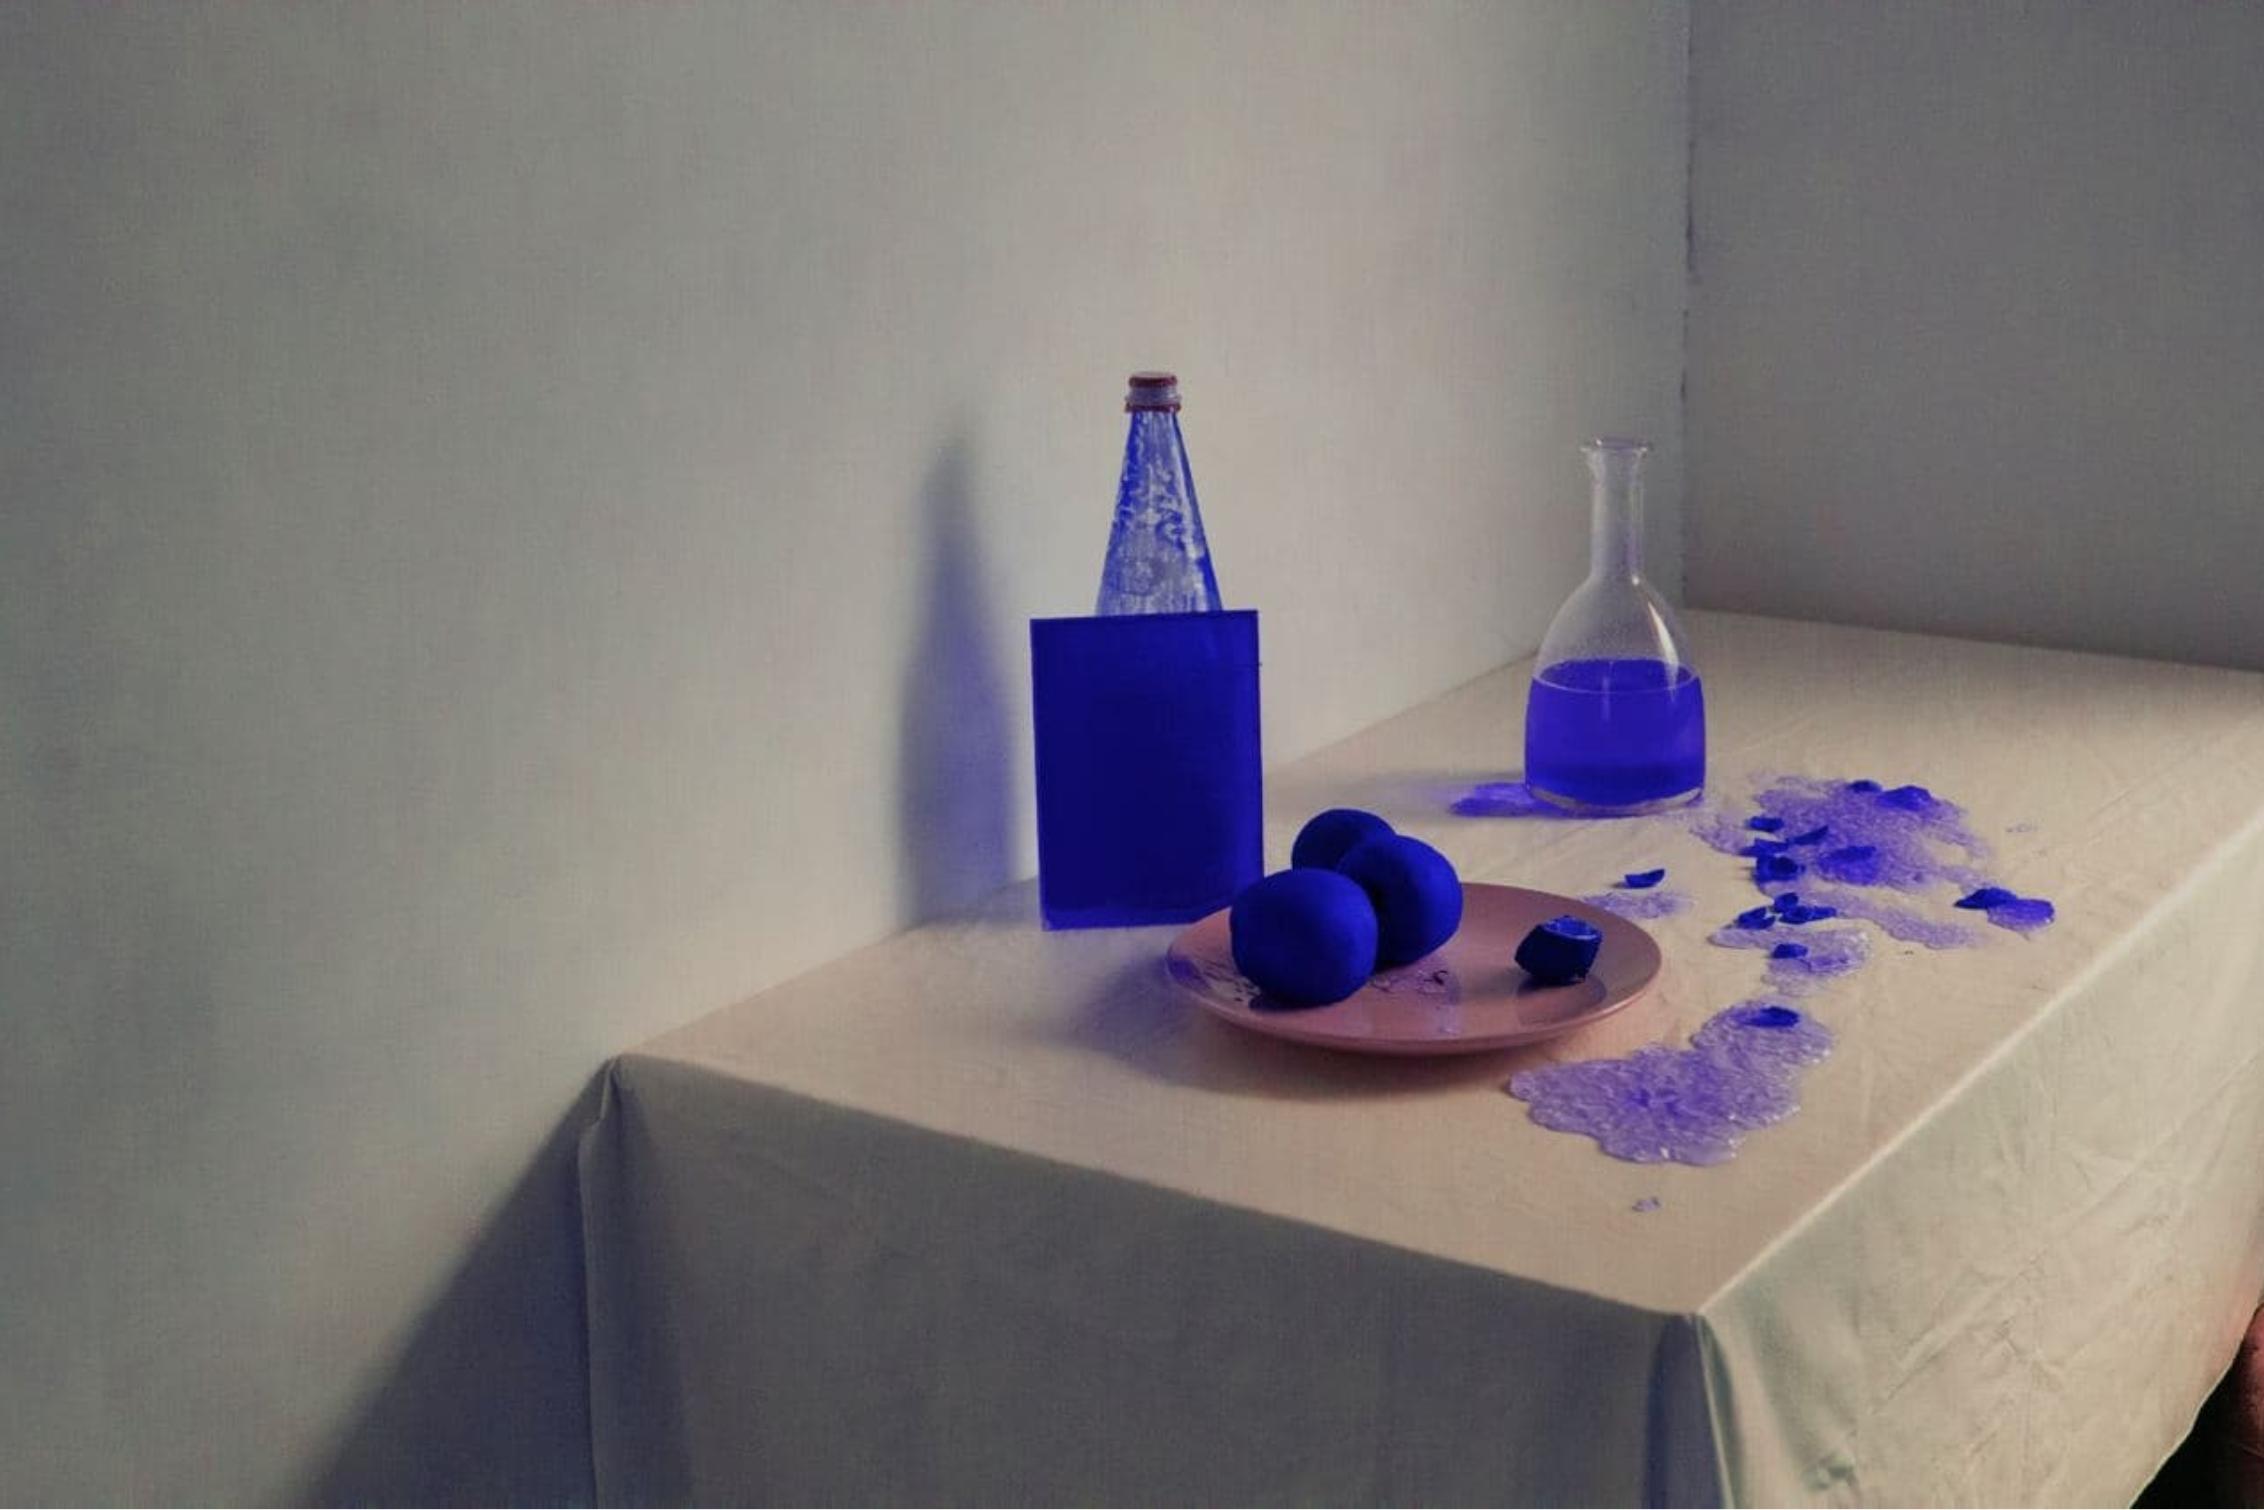 exhibition-image